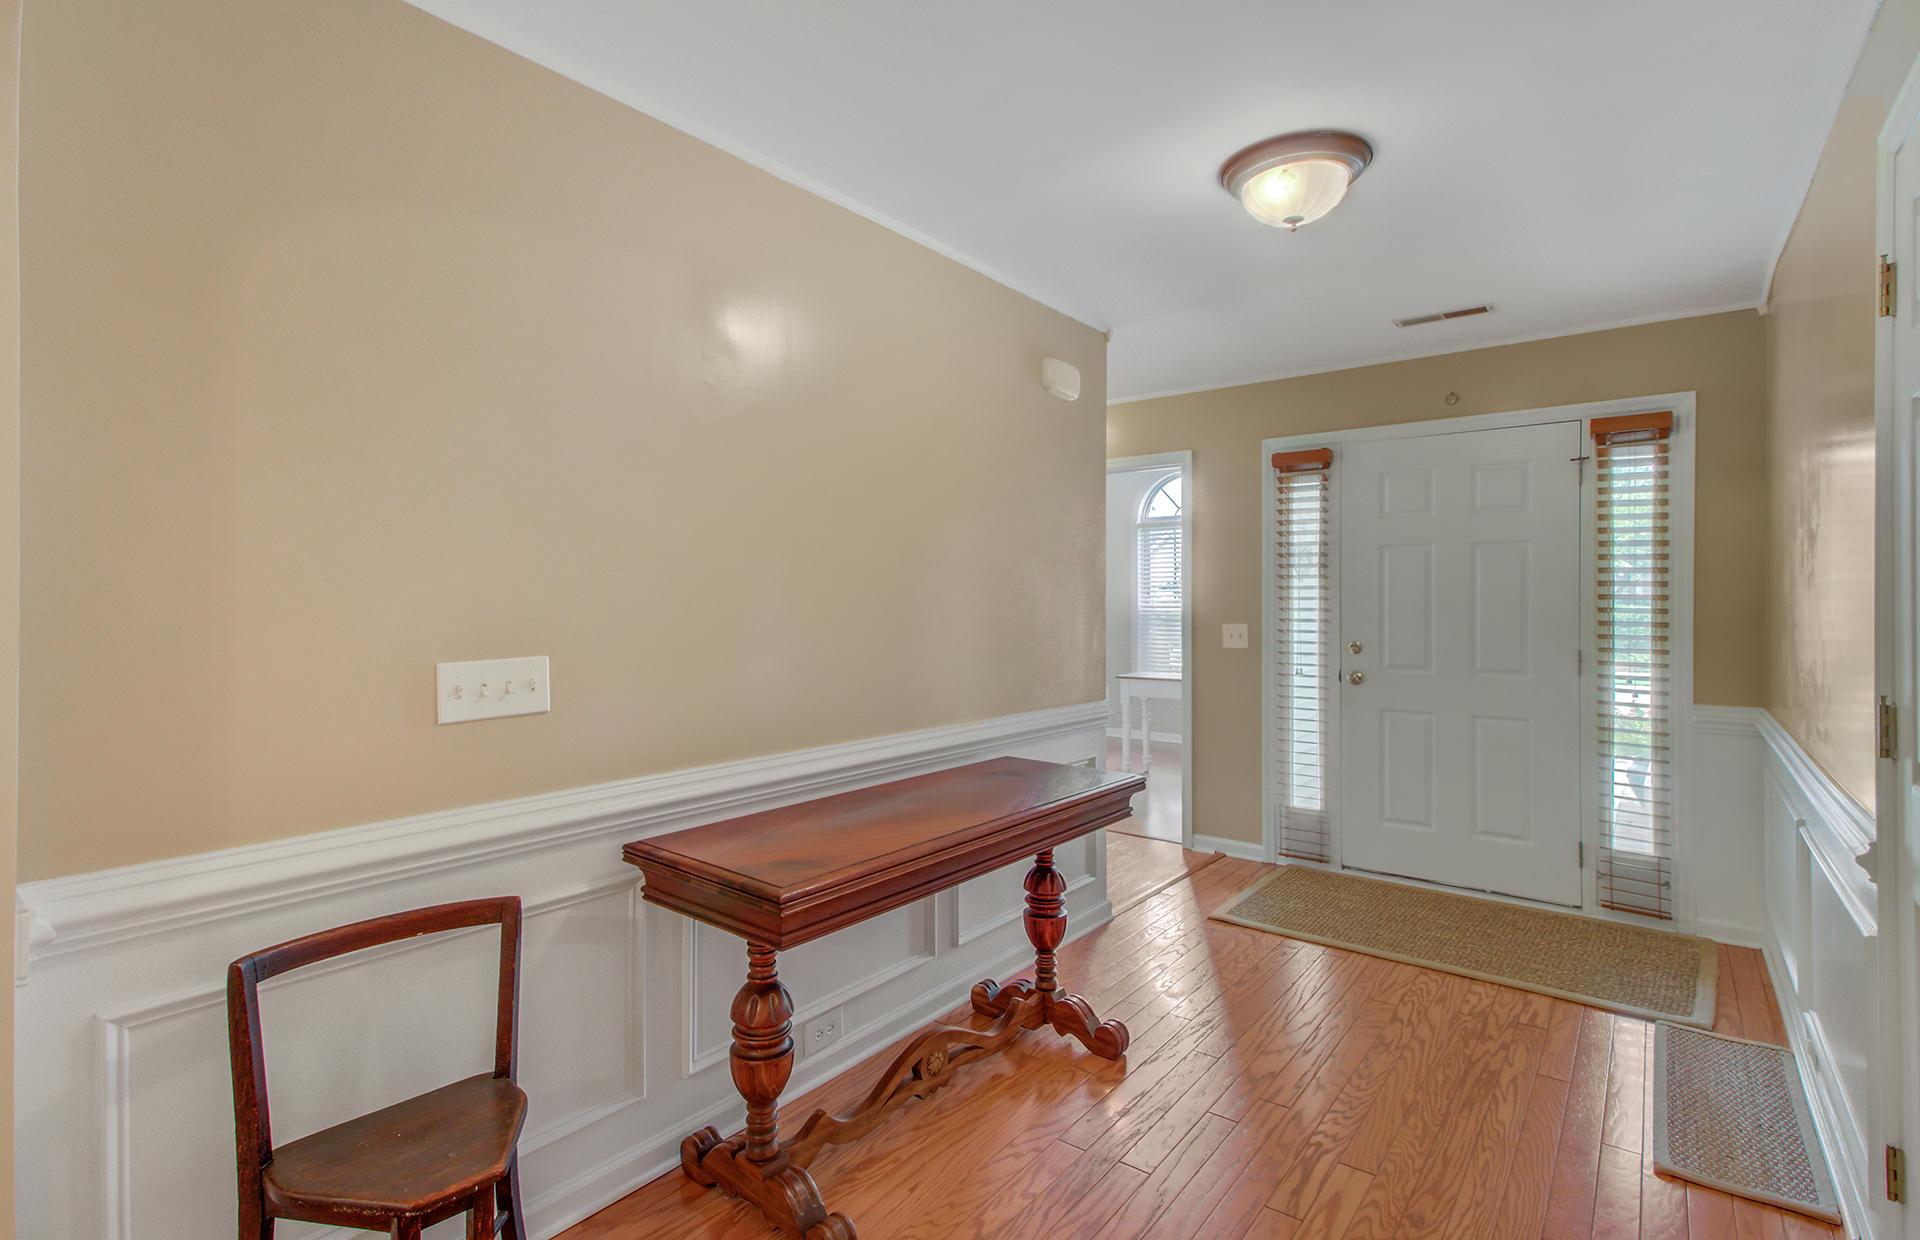 Park West Homes For Sale - 1500 Wellesley, Mount Pleasant, SC - 22